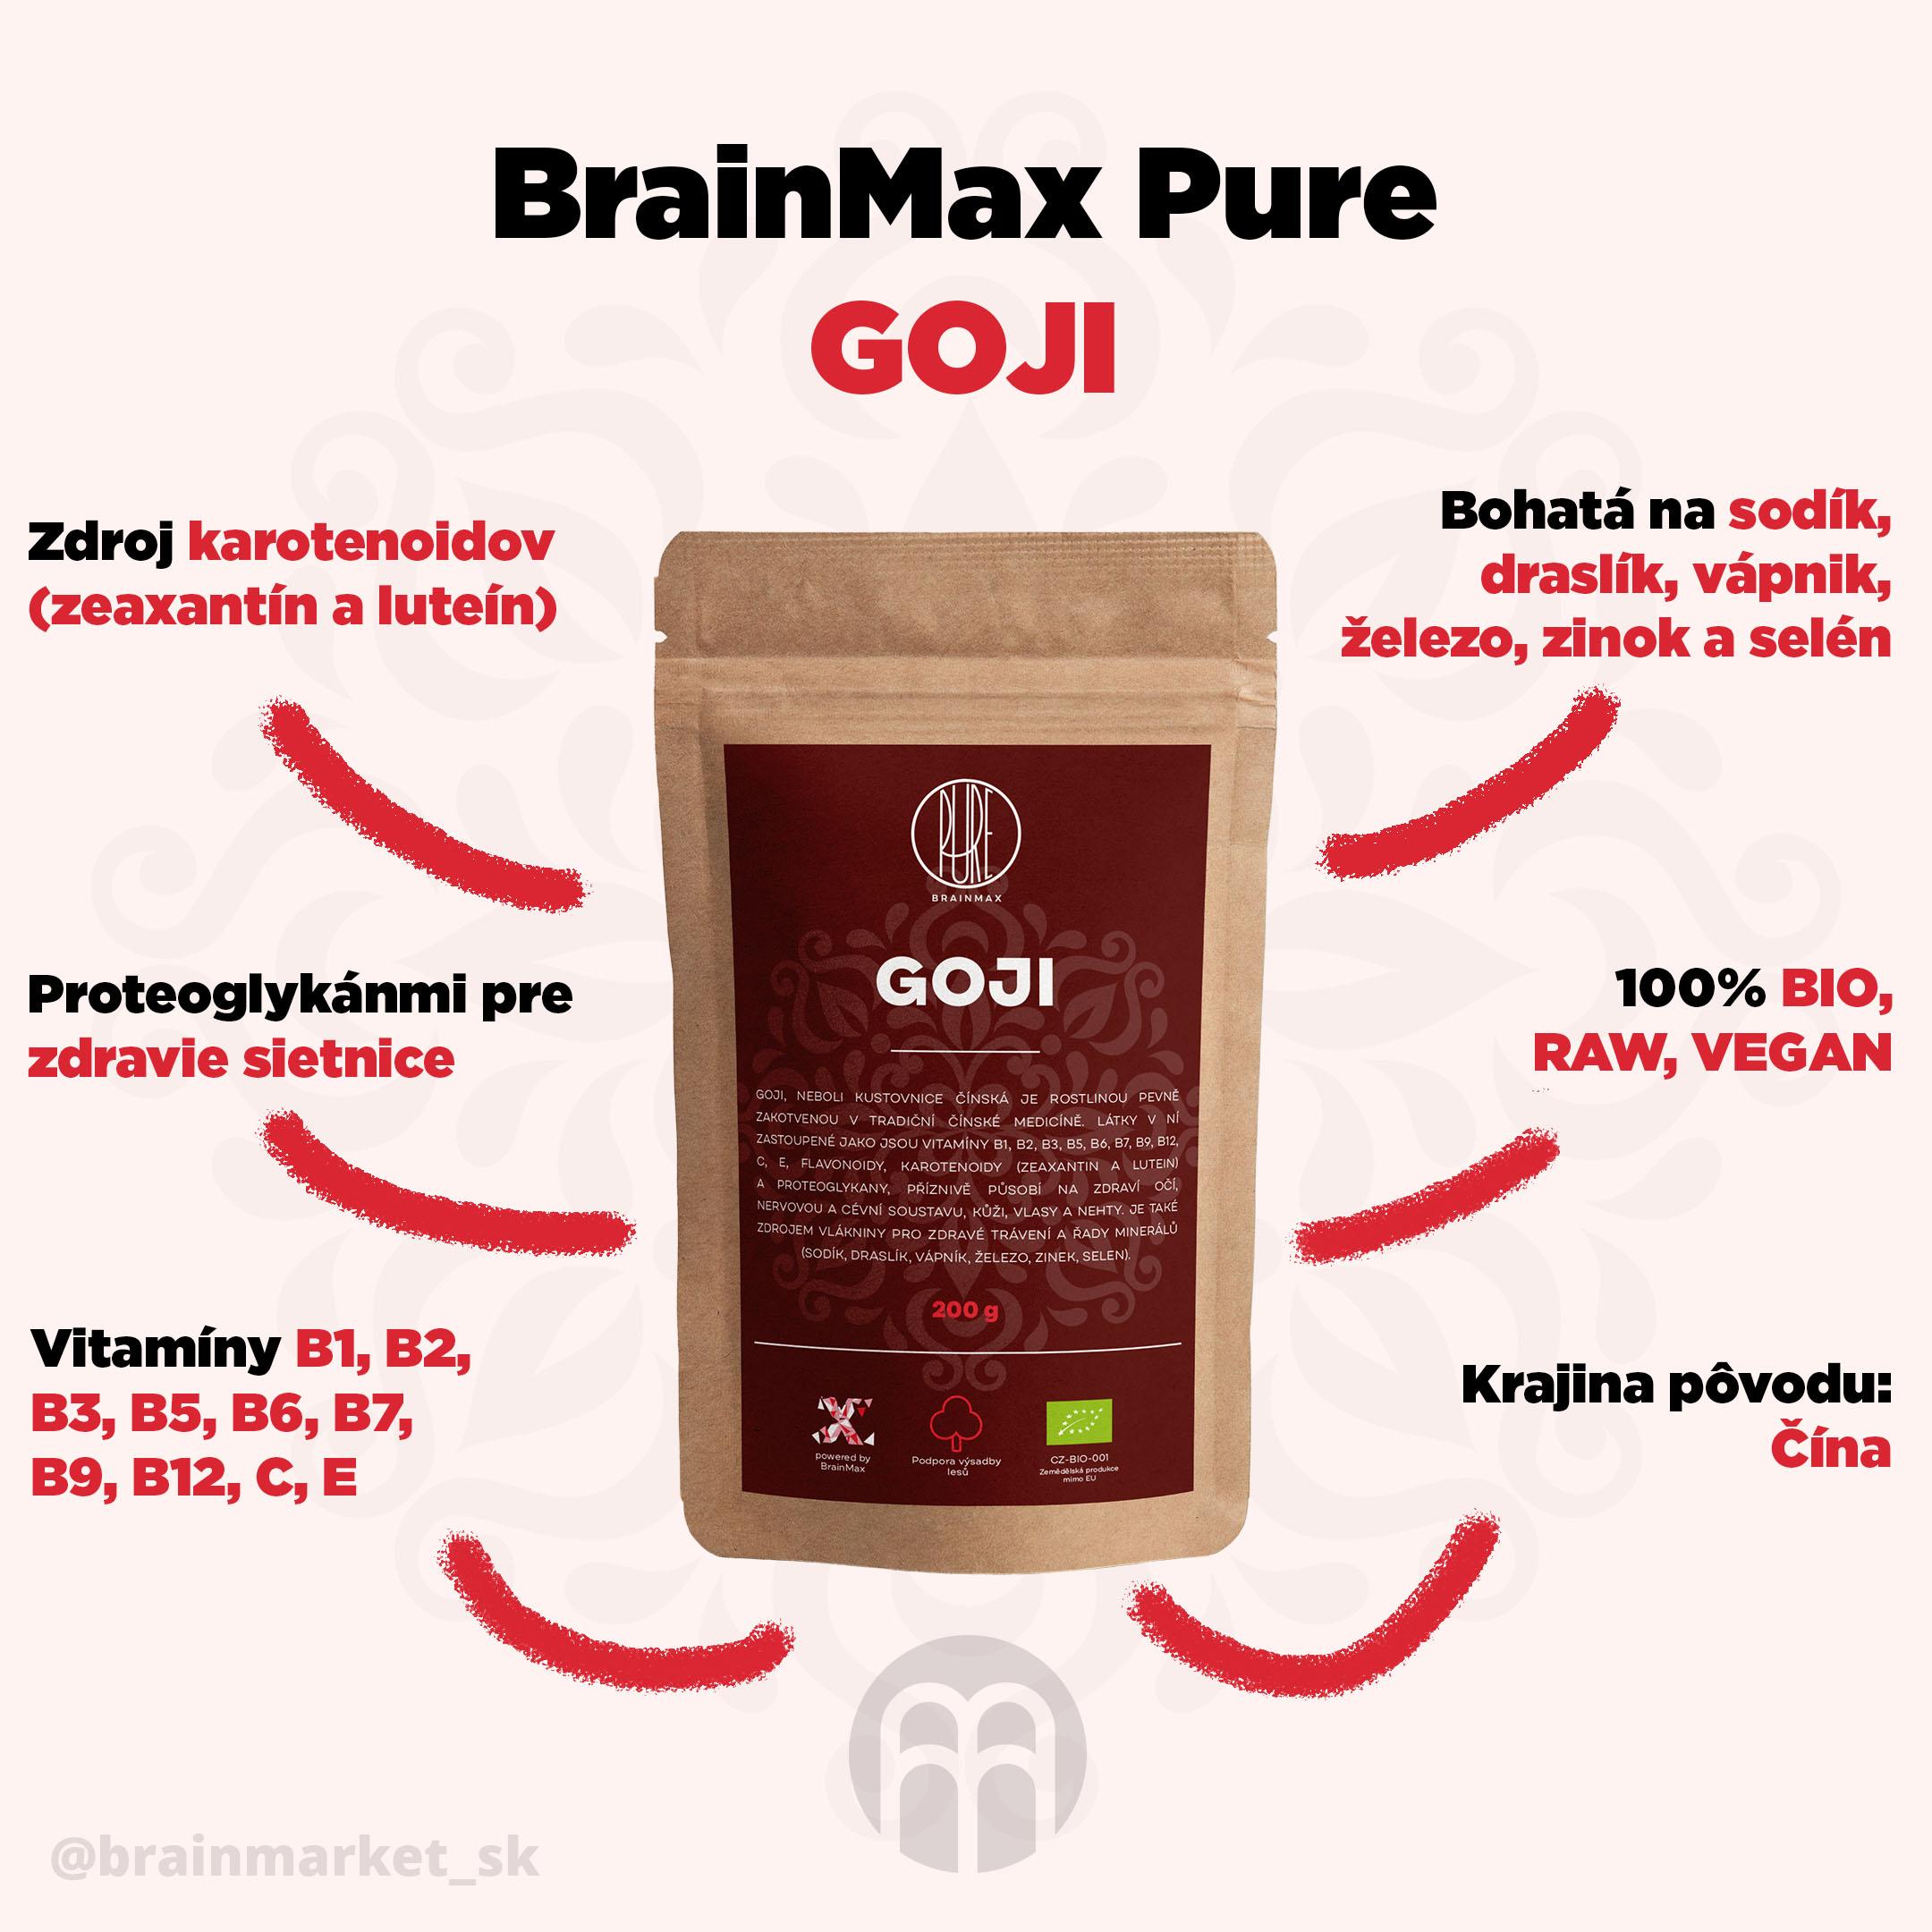 goji_infografika_brainmarket_sk